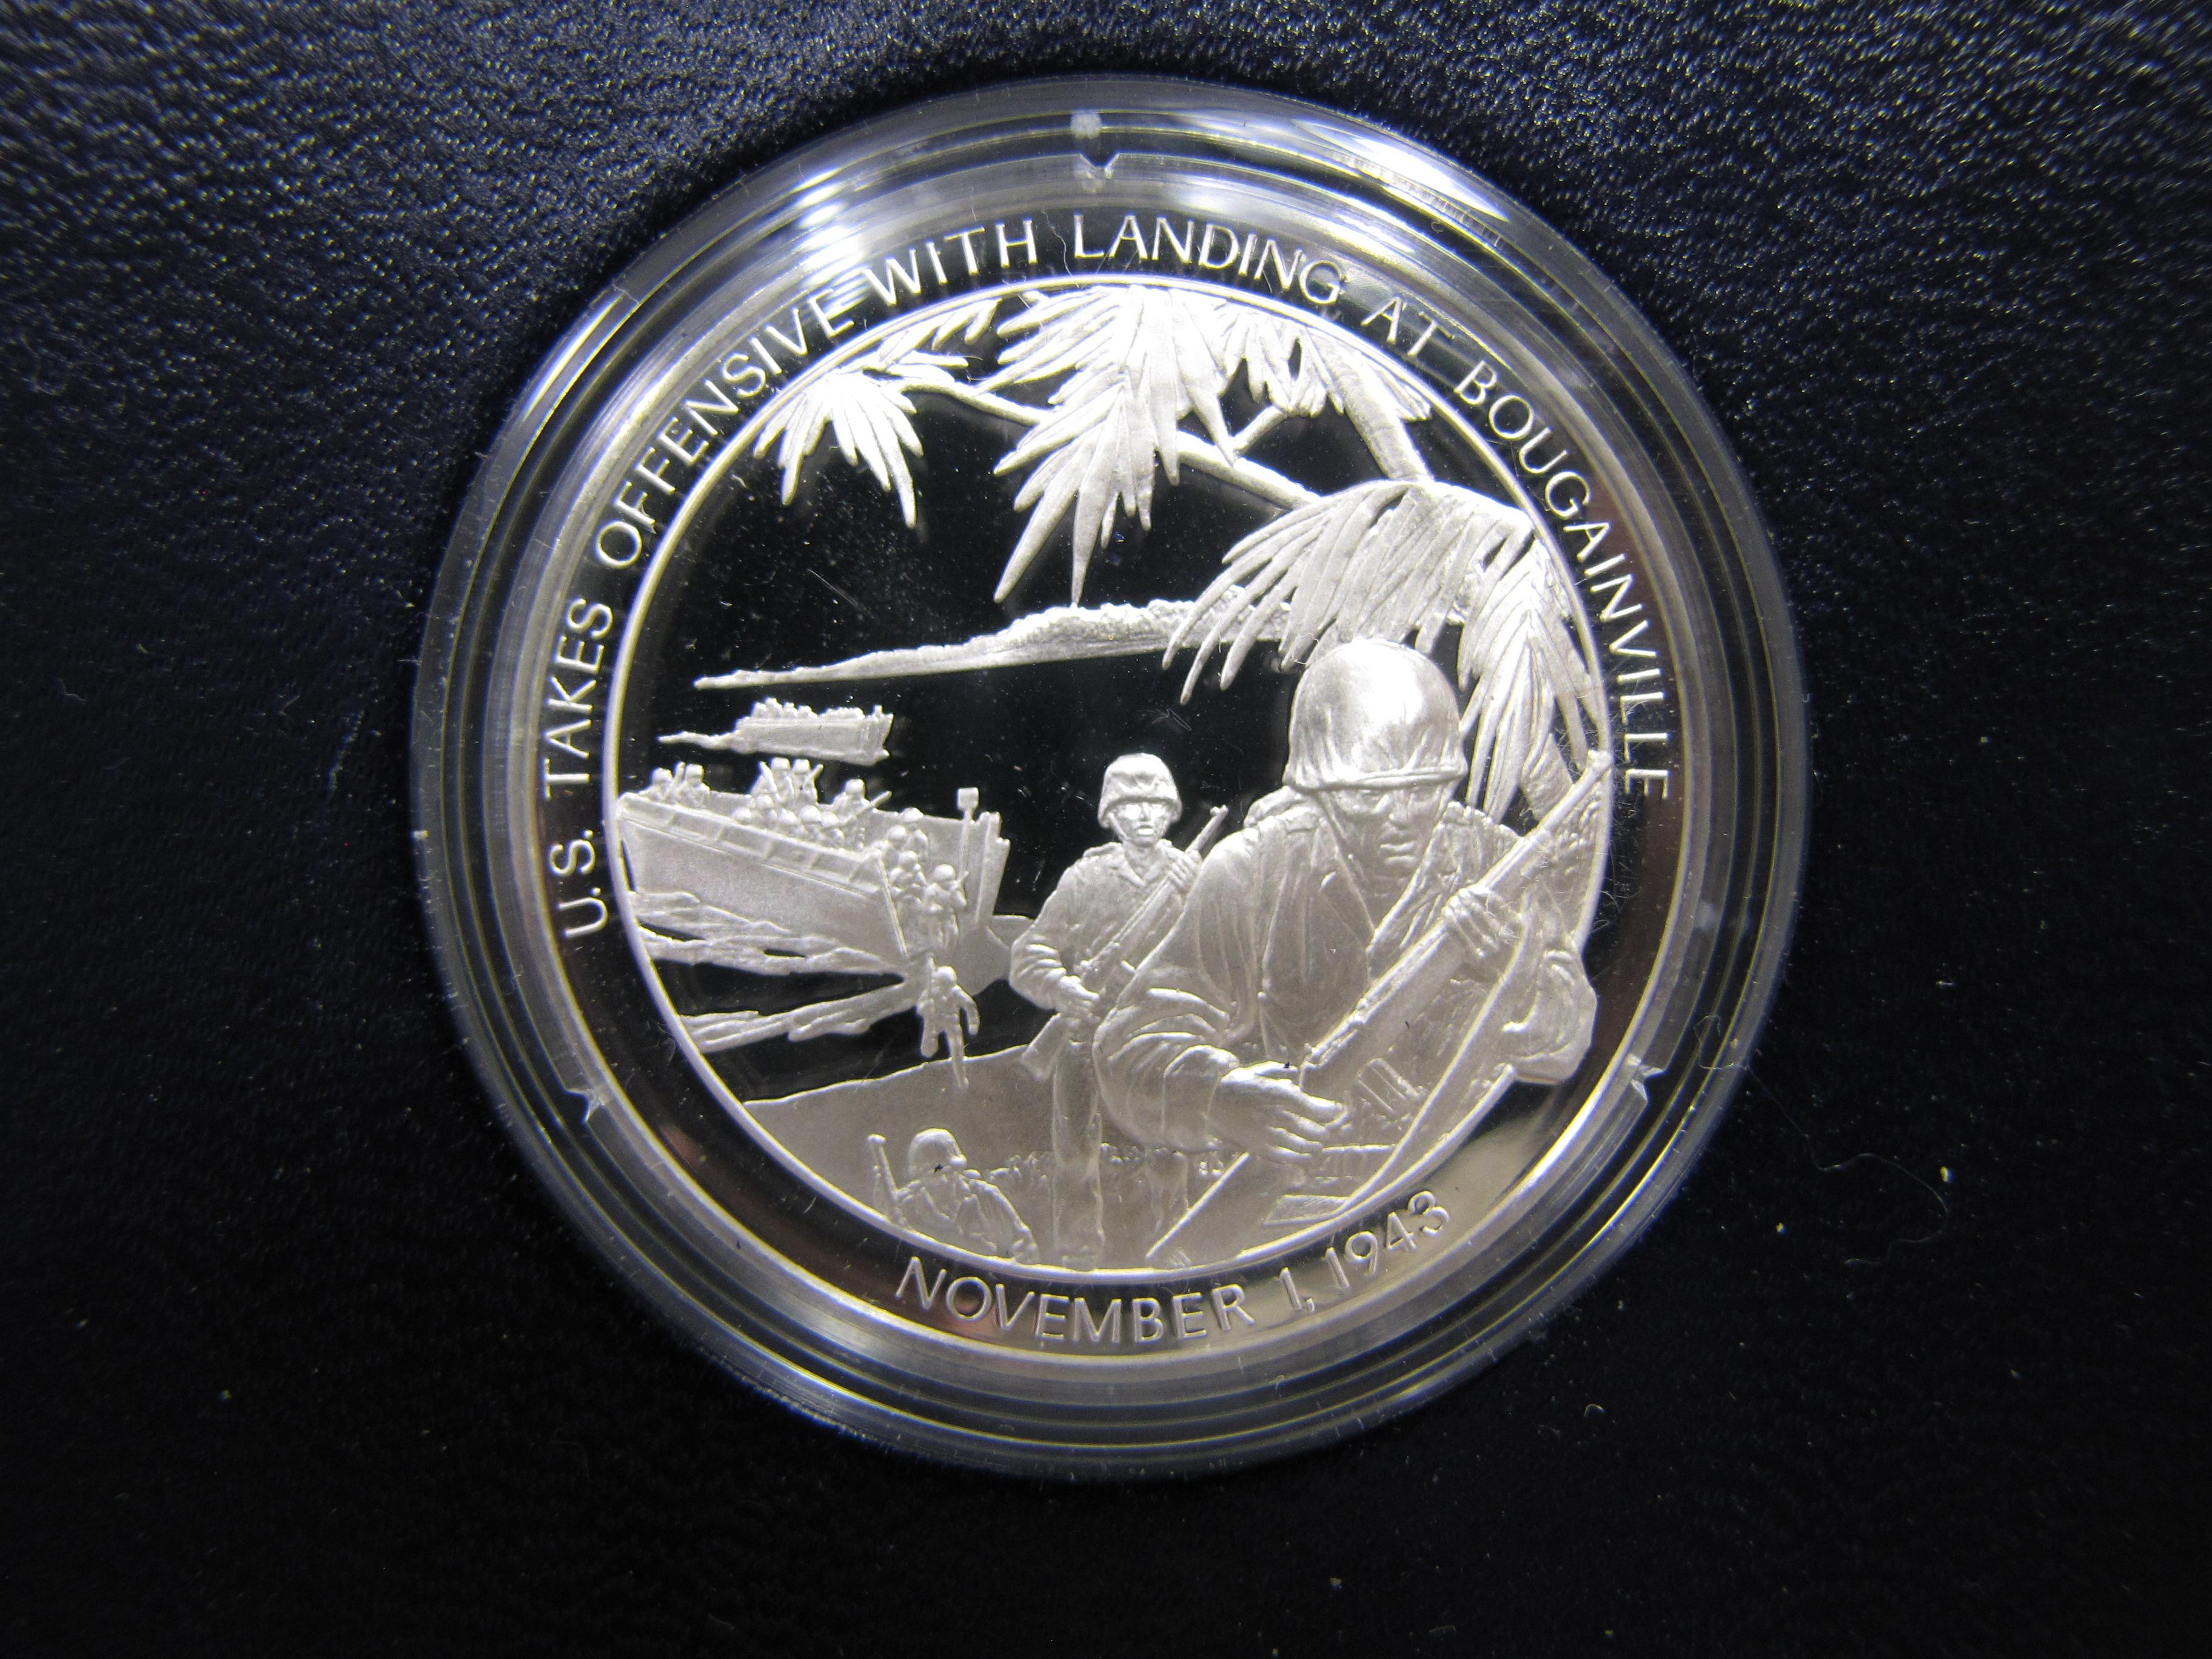 Us Silver Commemorative Coin Values 1776 1976 Dwight D